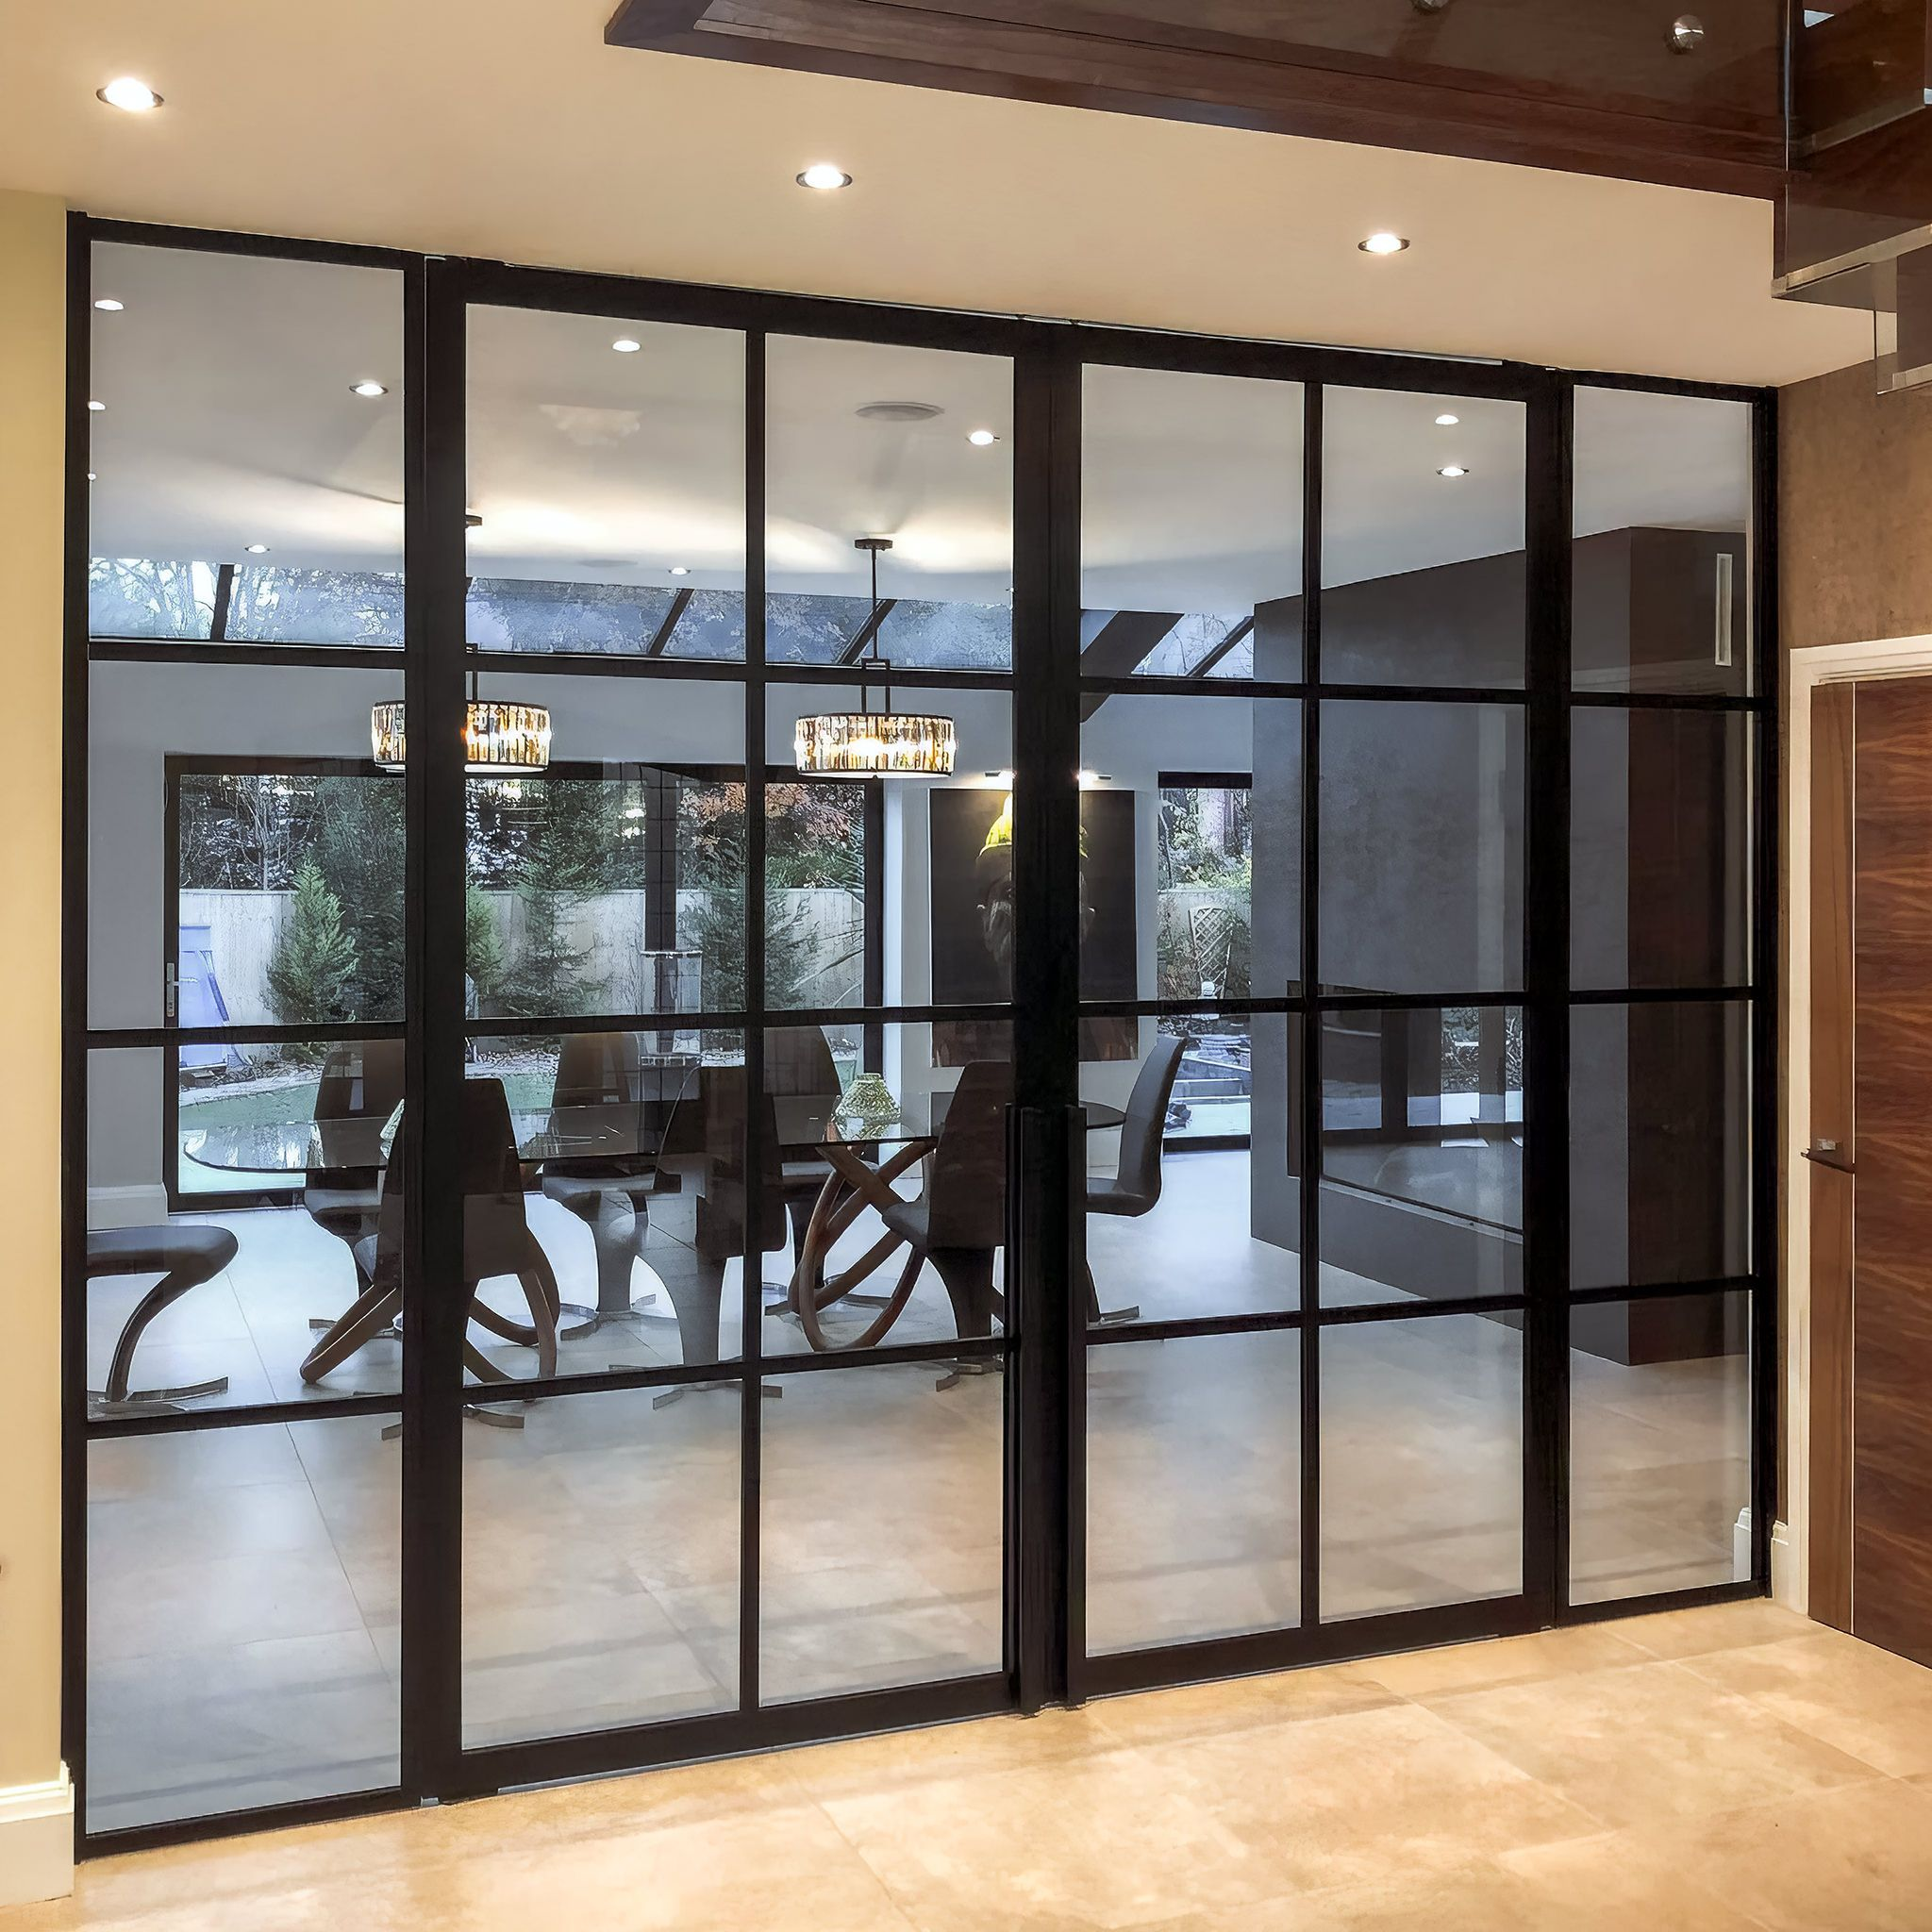 Crittall Style Home Office Partition Room Divider Doors Sliding Door Room Dividers Internal Glass Doors